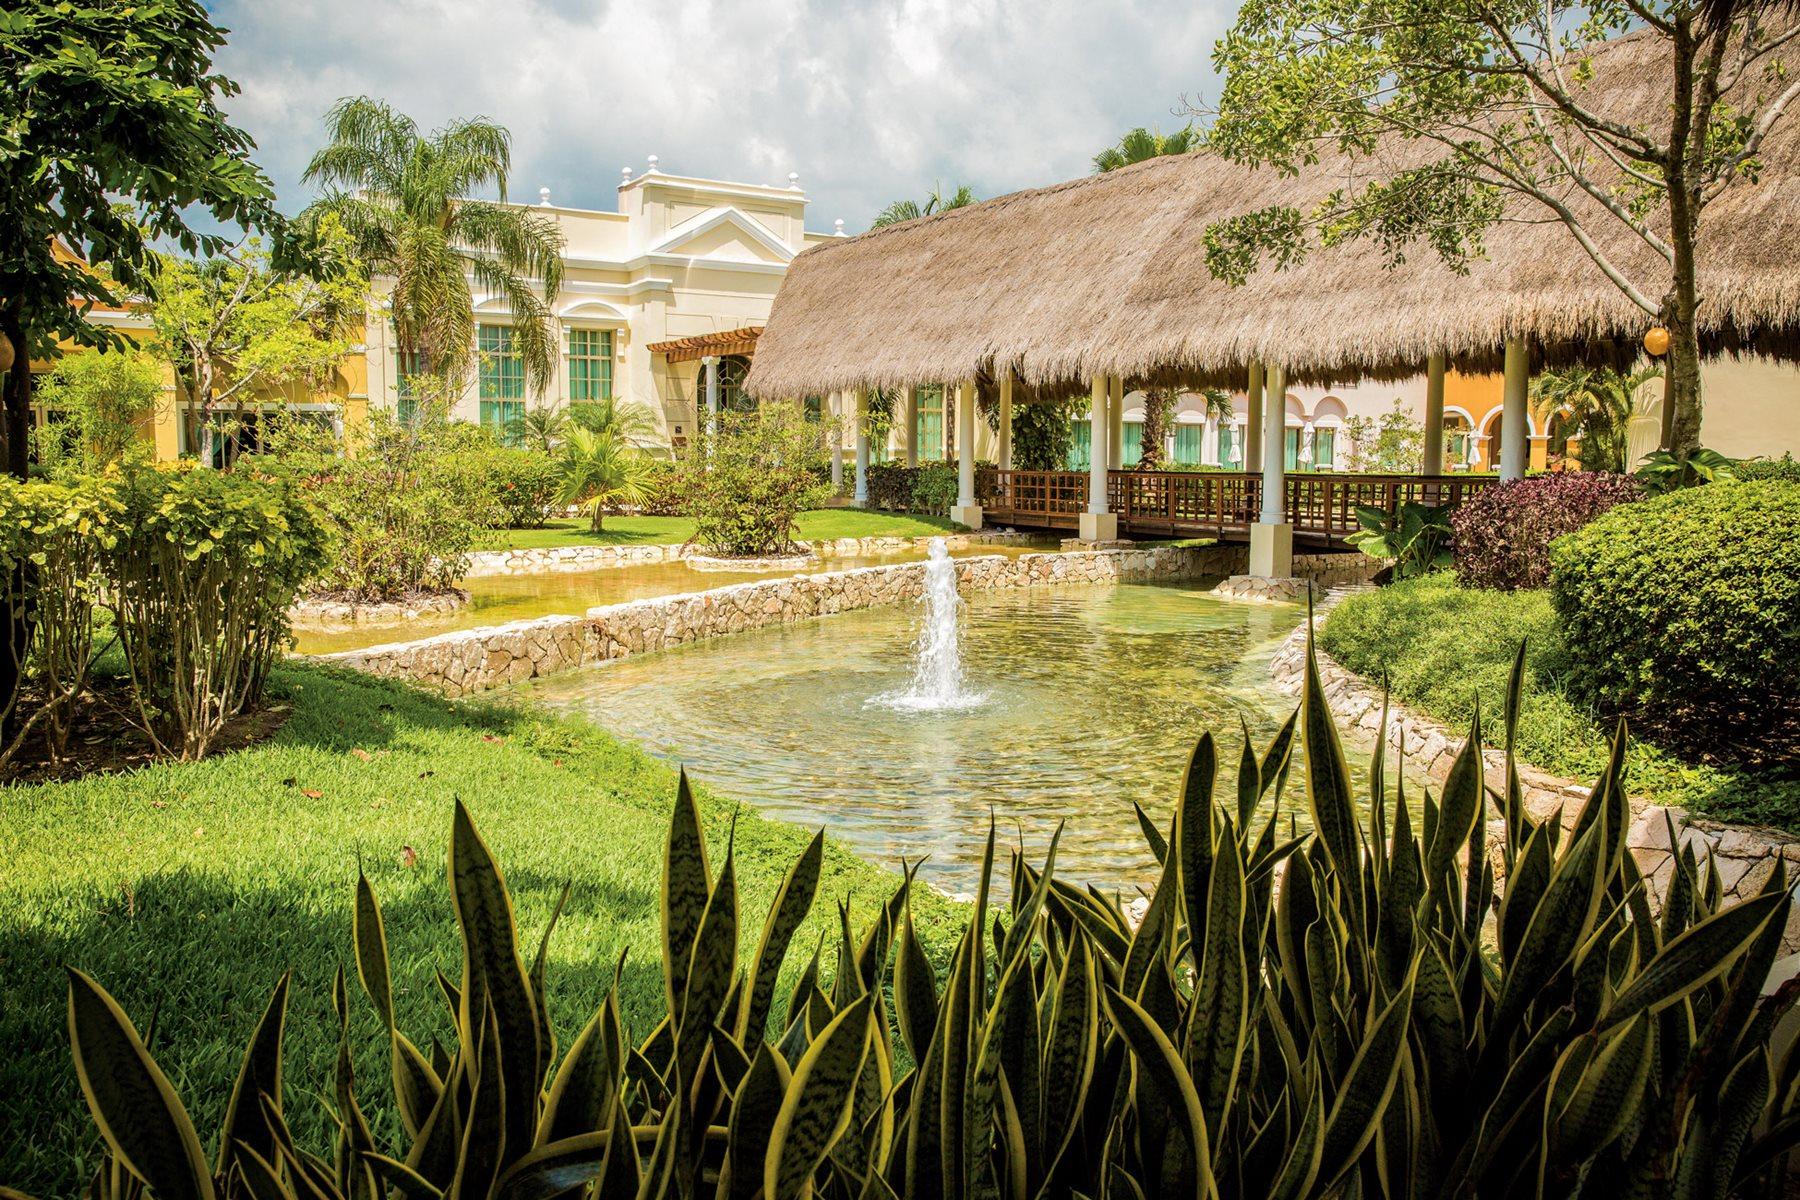 RIV-Valentin-Imperial-Maya-Garden-002